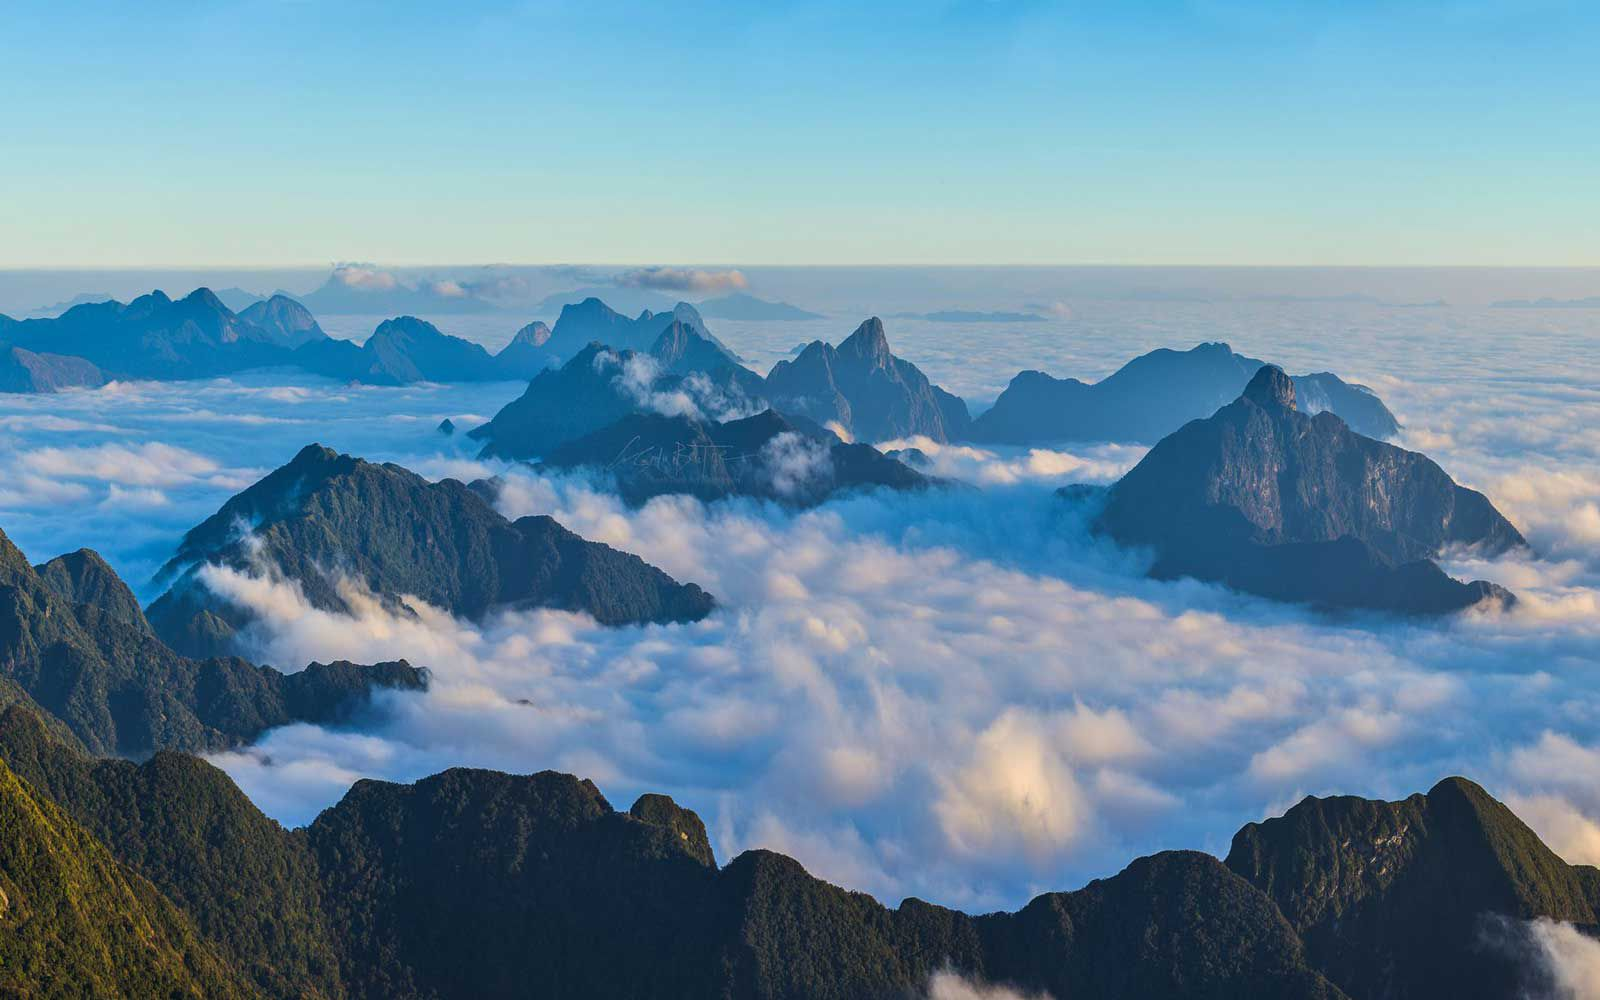 Ocean of cloud at the top of Fansipan